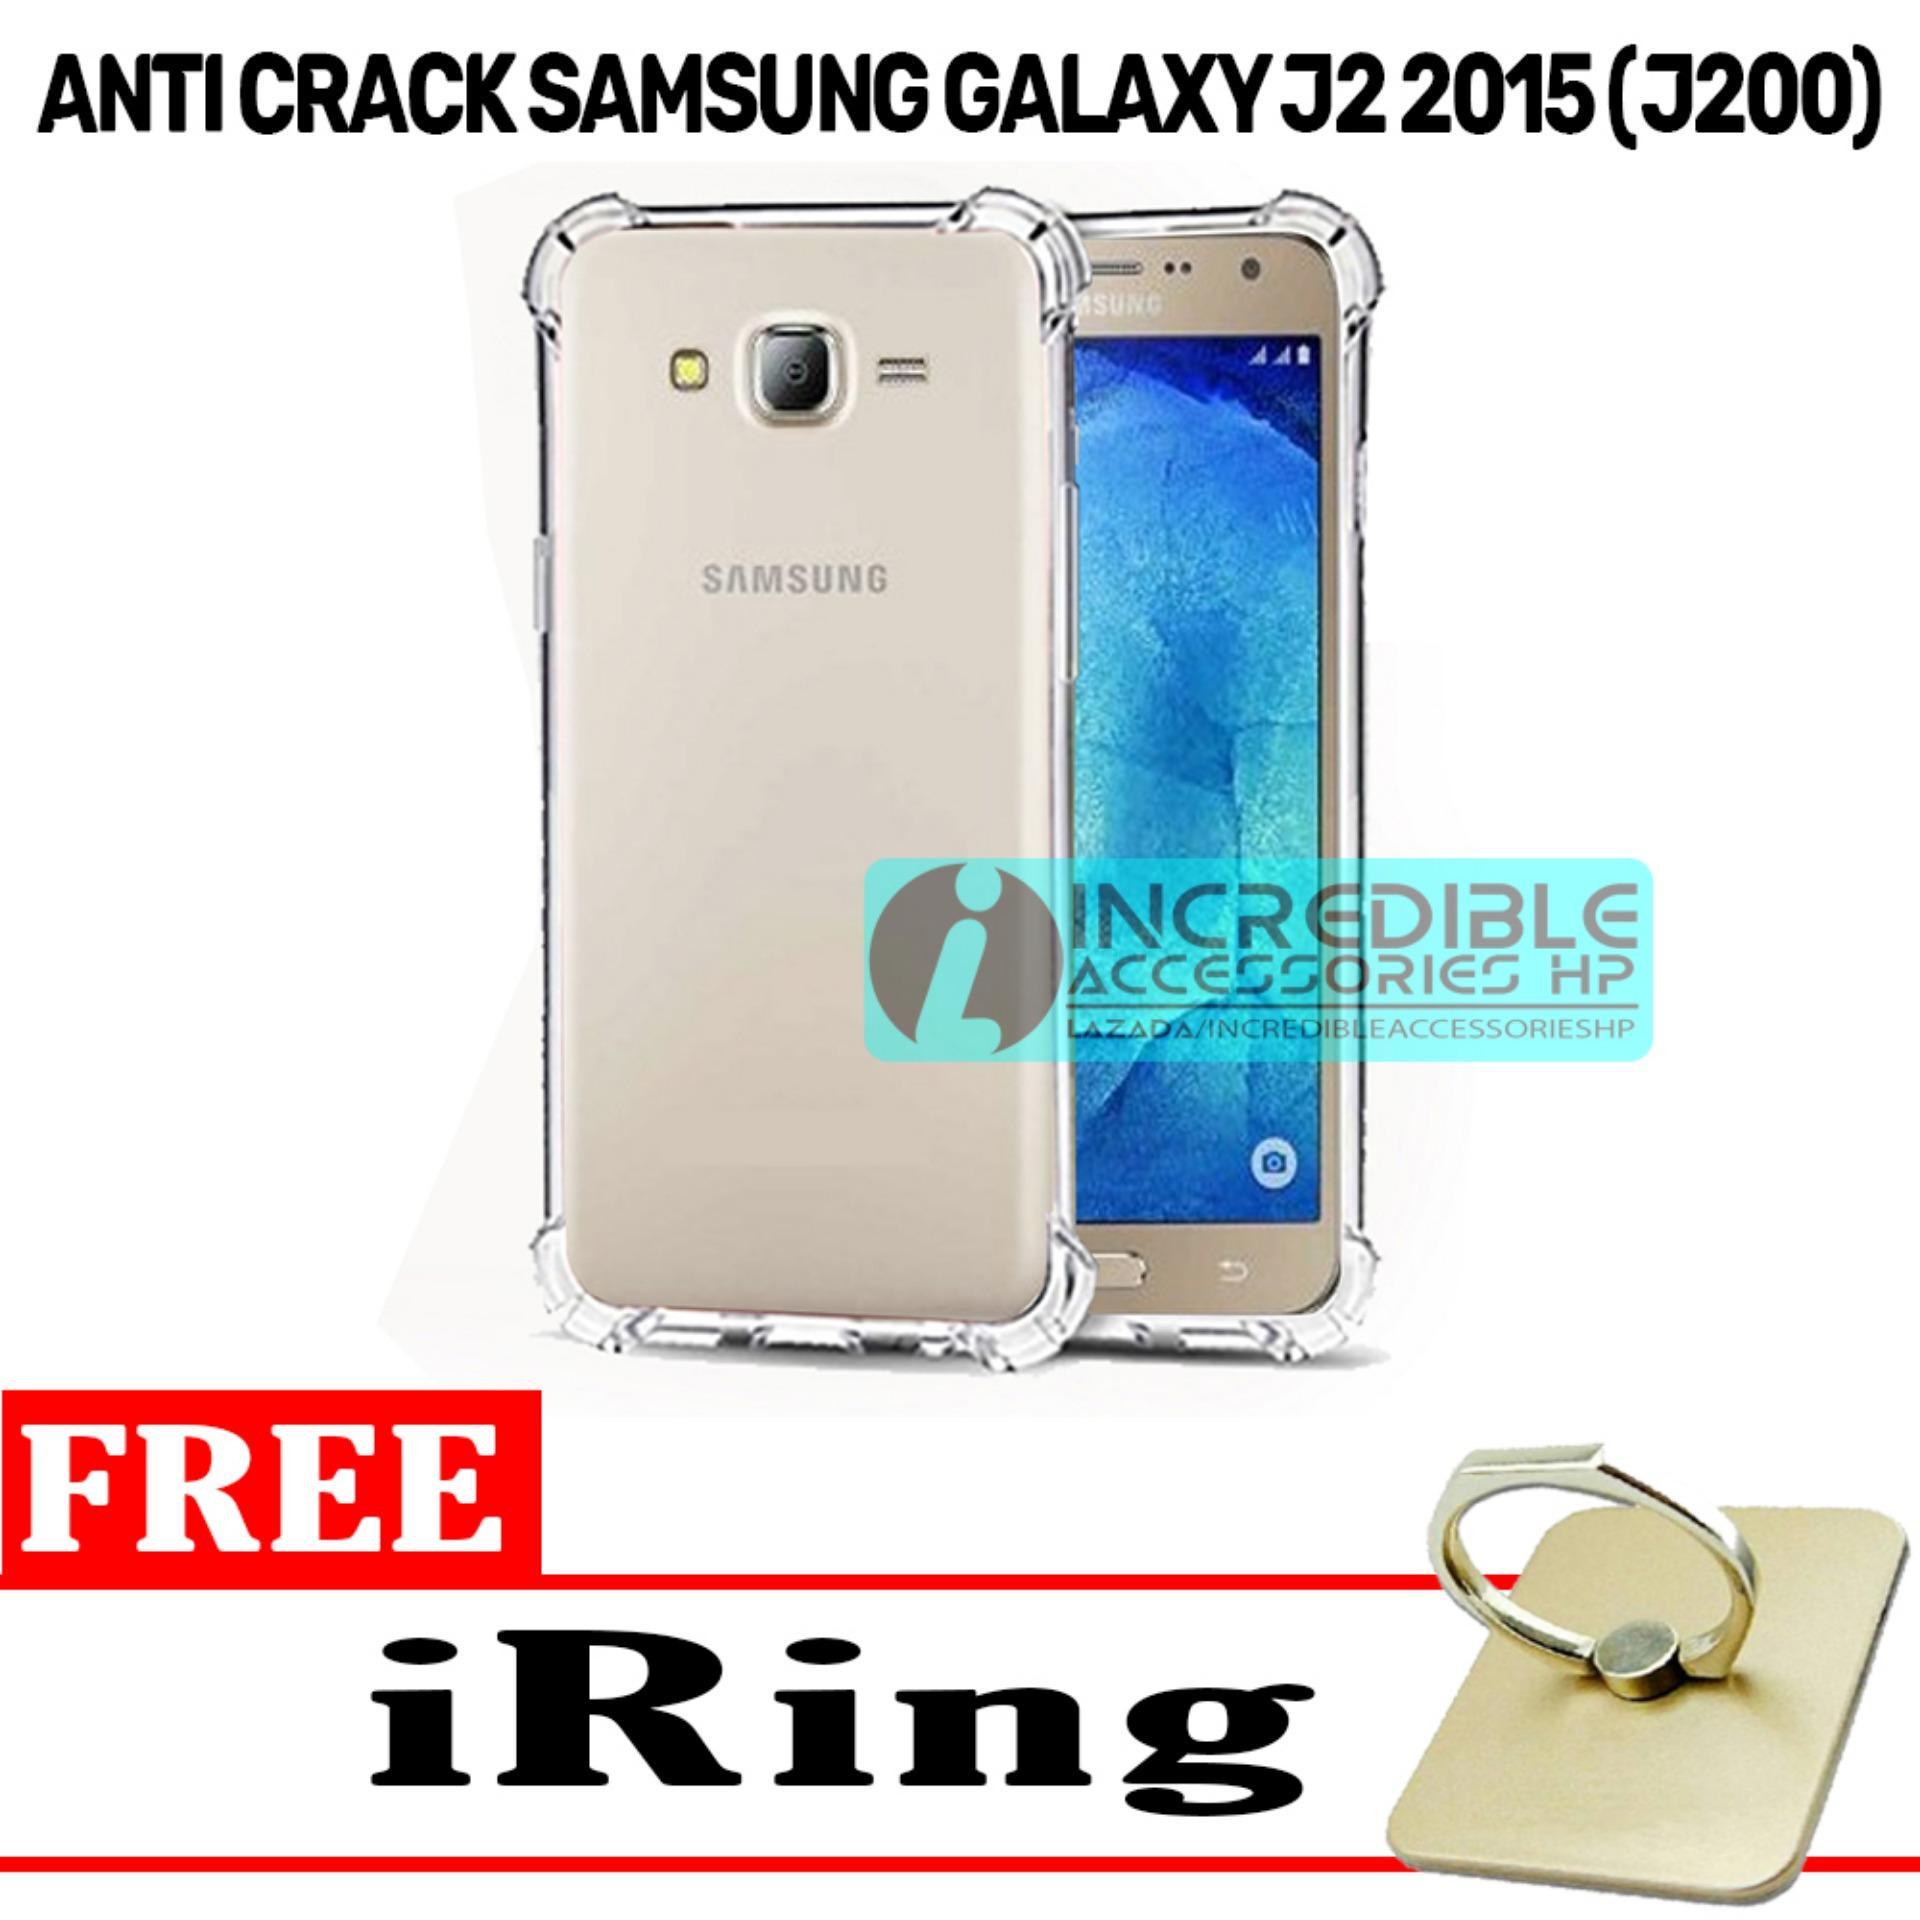 Case Anti Shock / Anti Crack Elegant Softcase  for Samsung Galaxy J2 2015 (J200) - White Clear + Free iRing